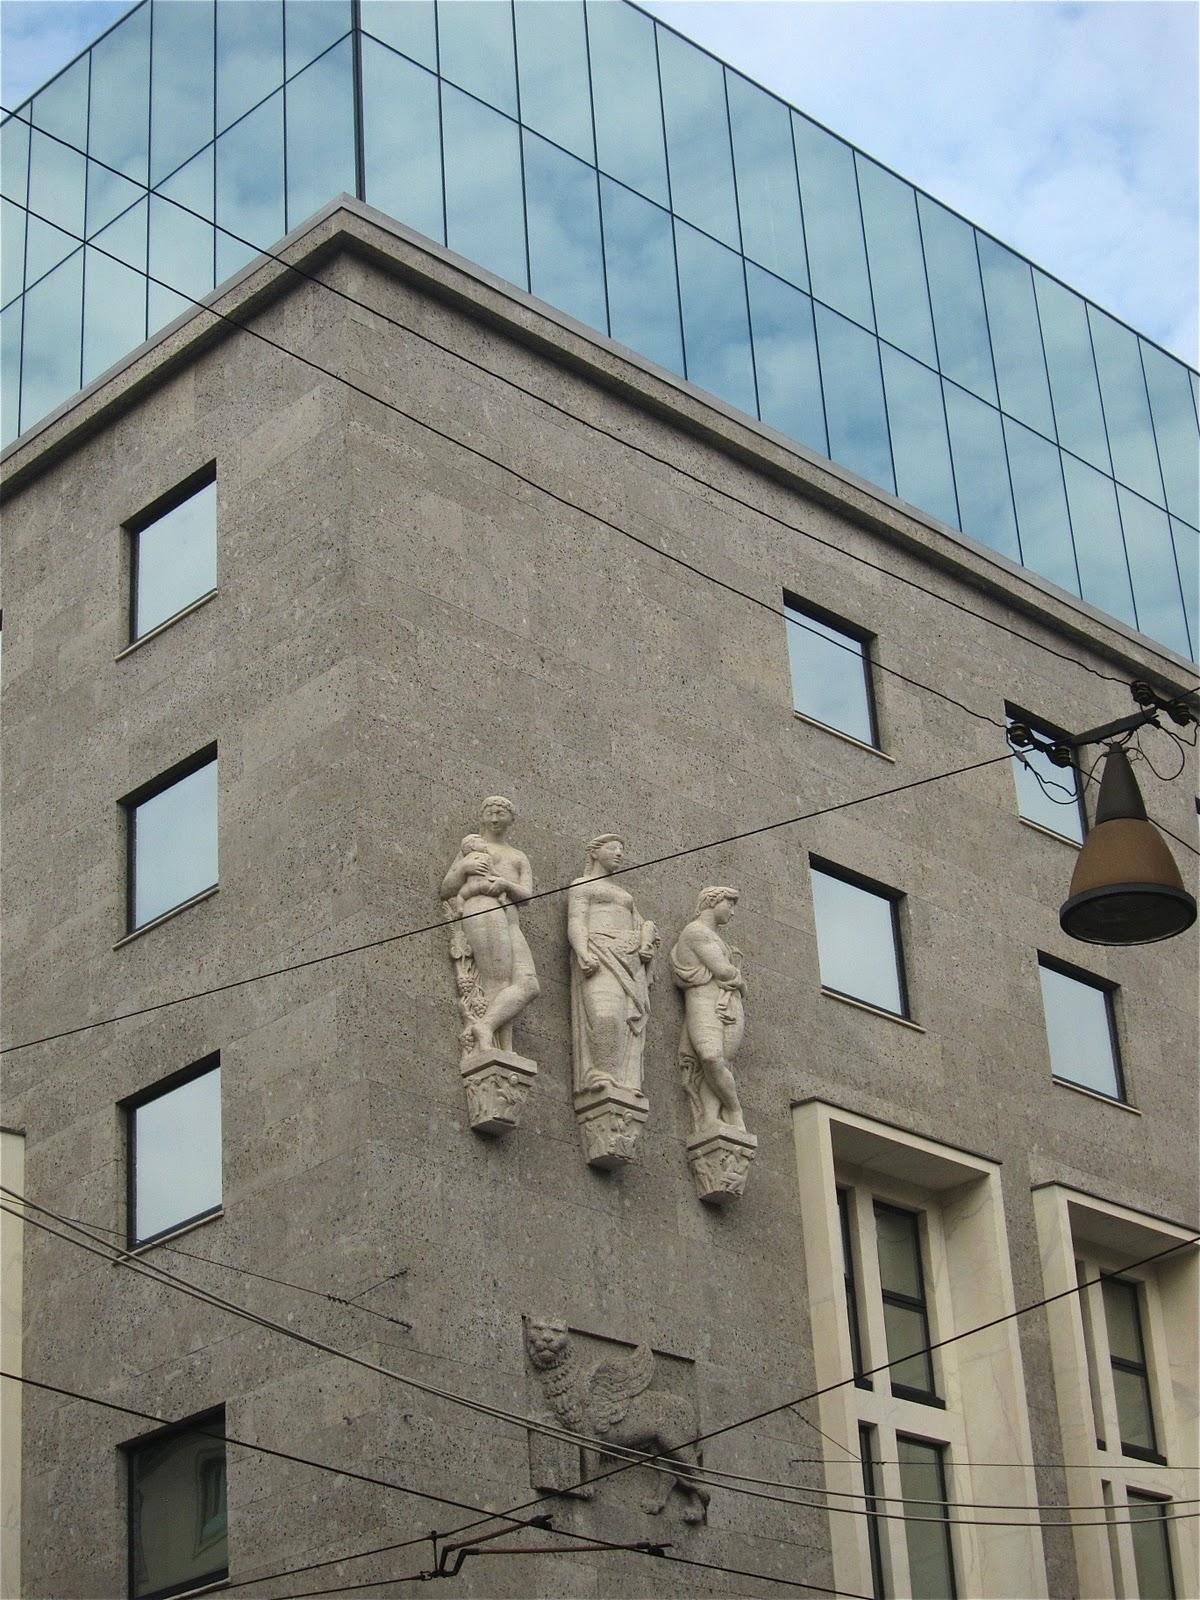 Armani Hotel Milano In 2019: Contessanally: December 2011